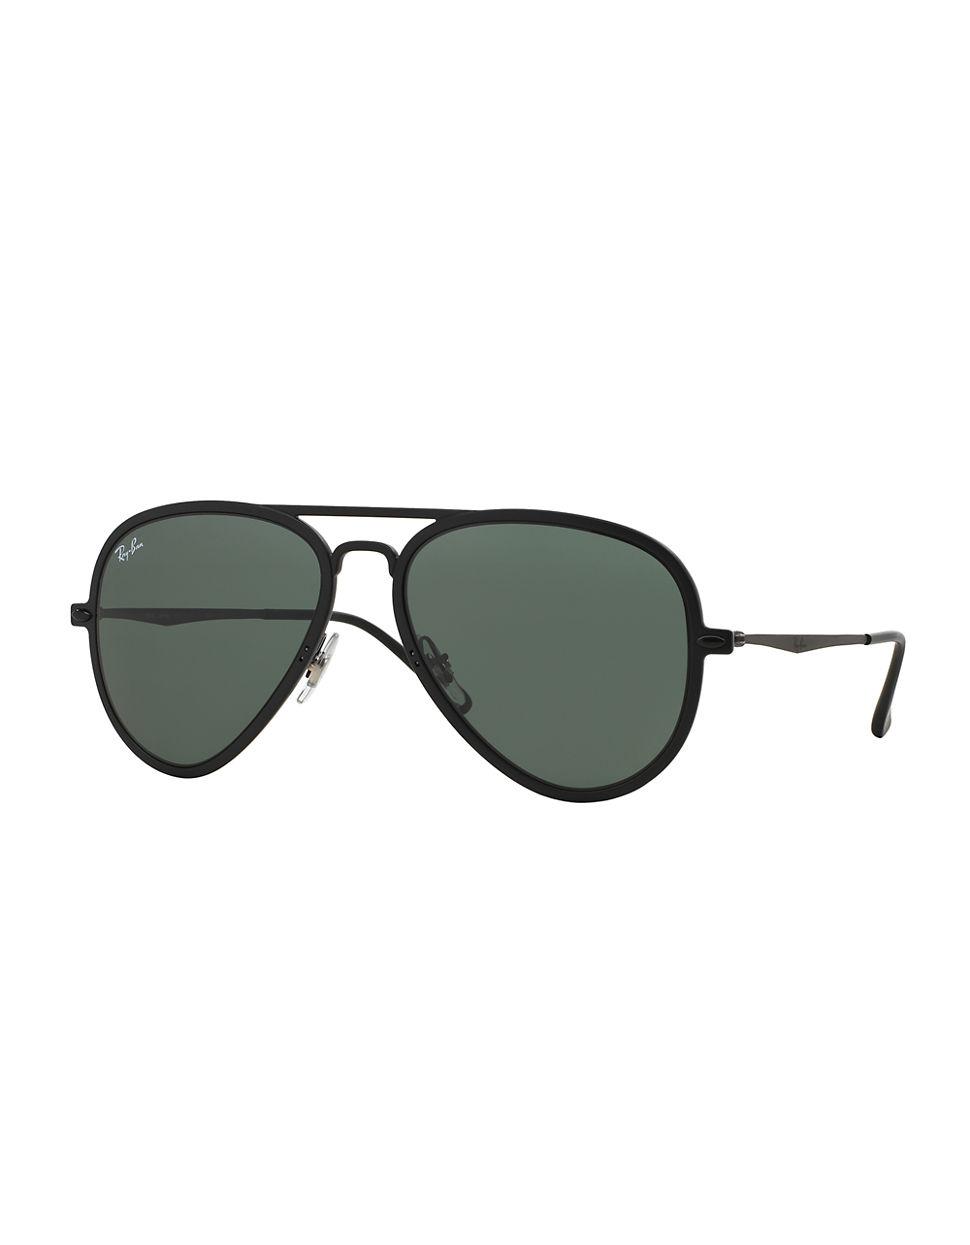 2f5a3b15f4c Ray Ban Black Aviator Sunglasses Blue Tint To Whites « Heritage Malta